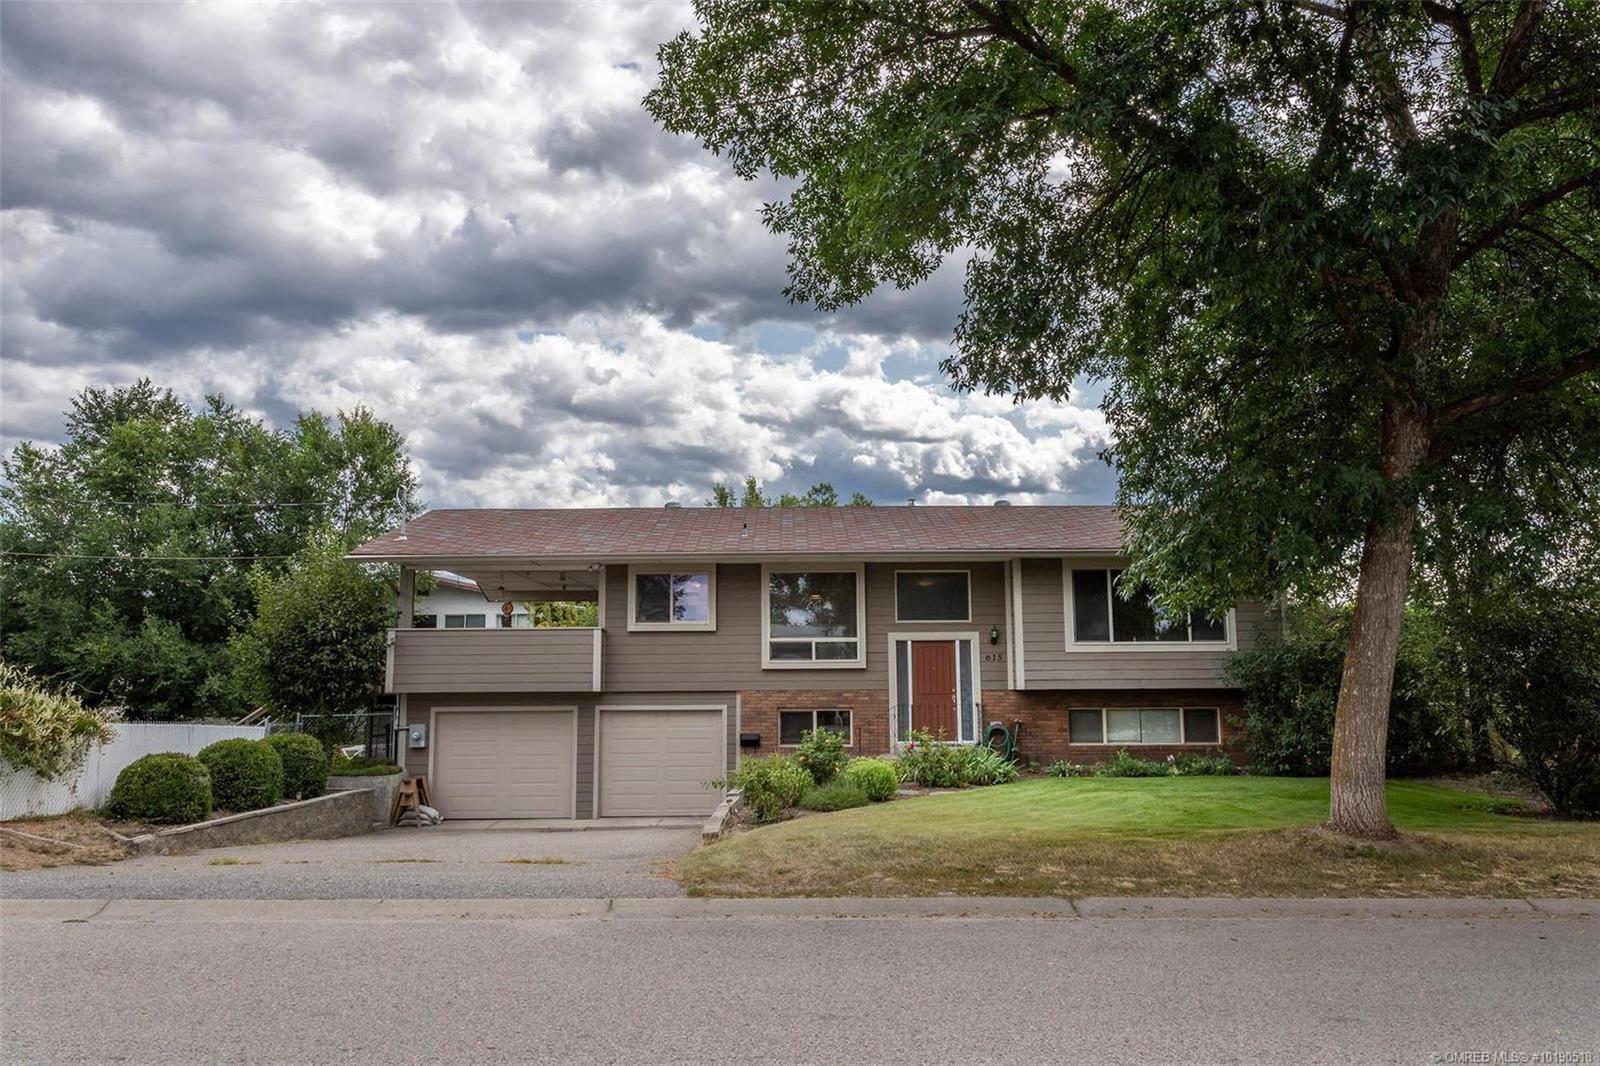 House for sale at 615 Mark Rd Kelowna British Columbia - MLS: 10190518